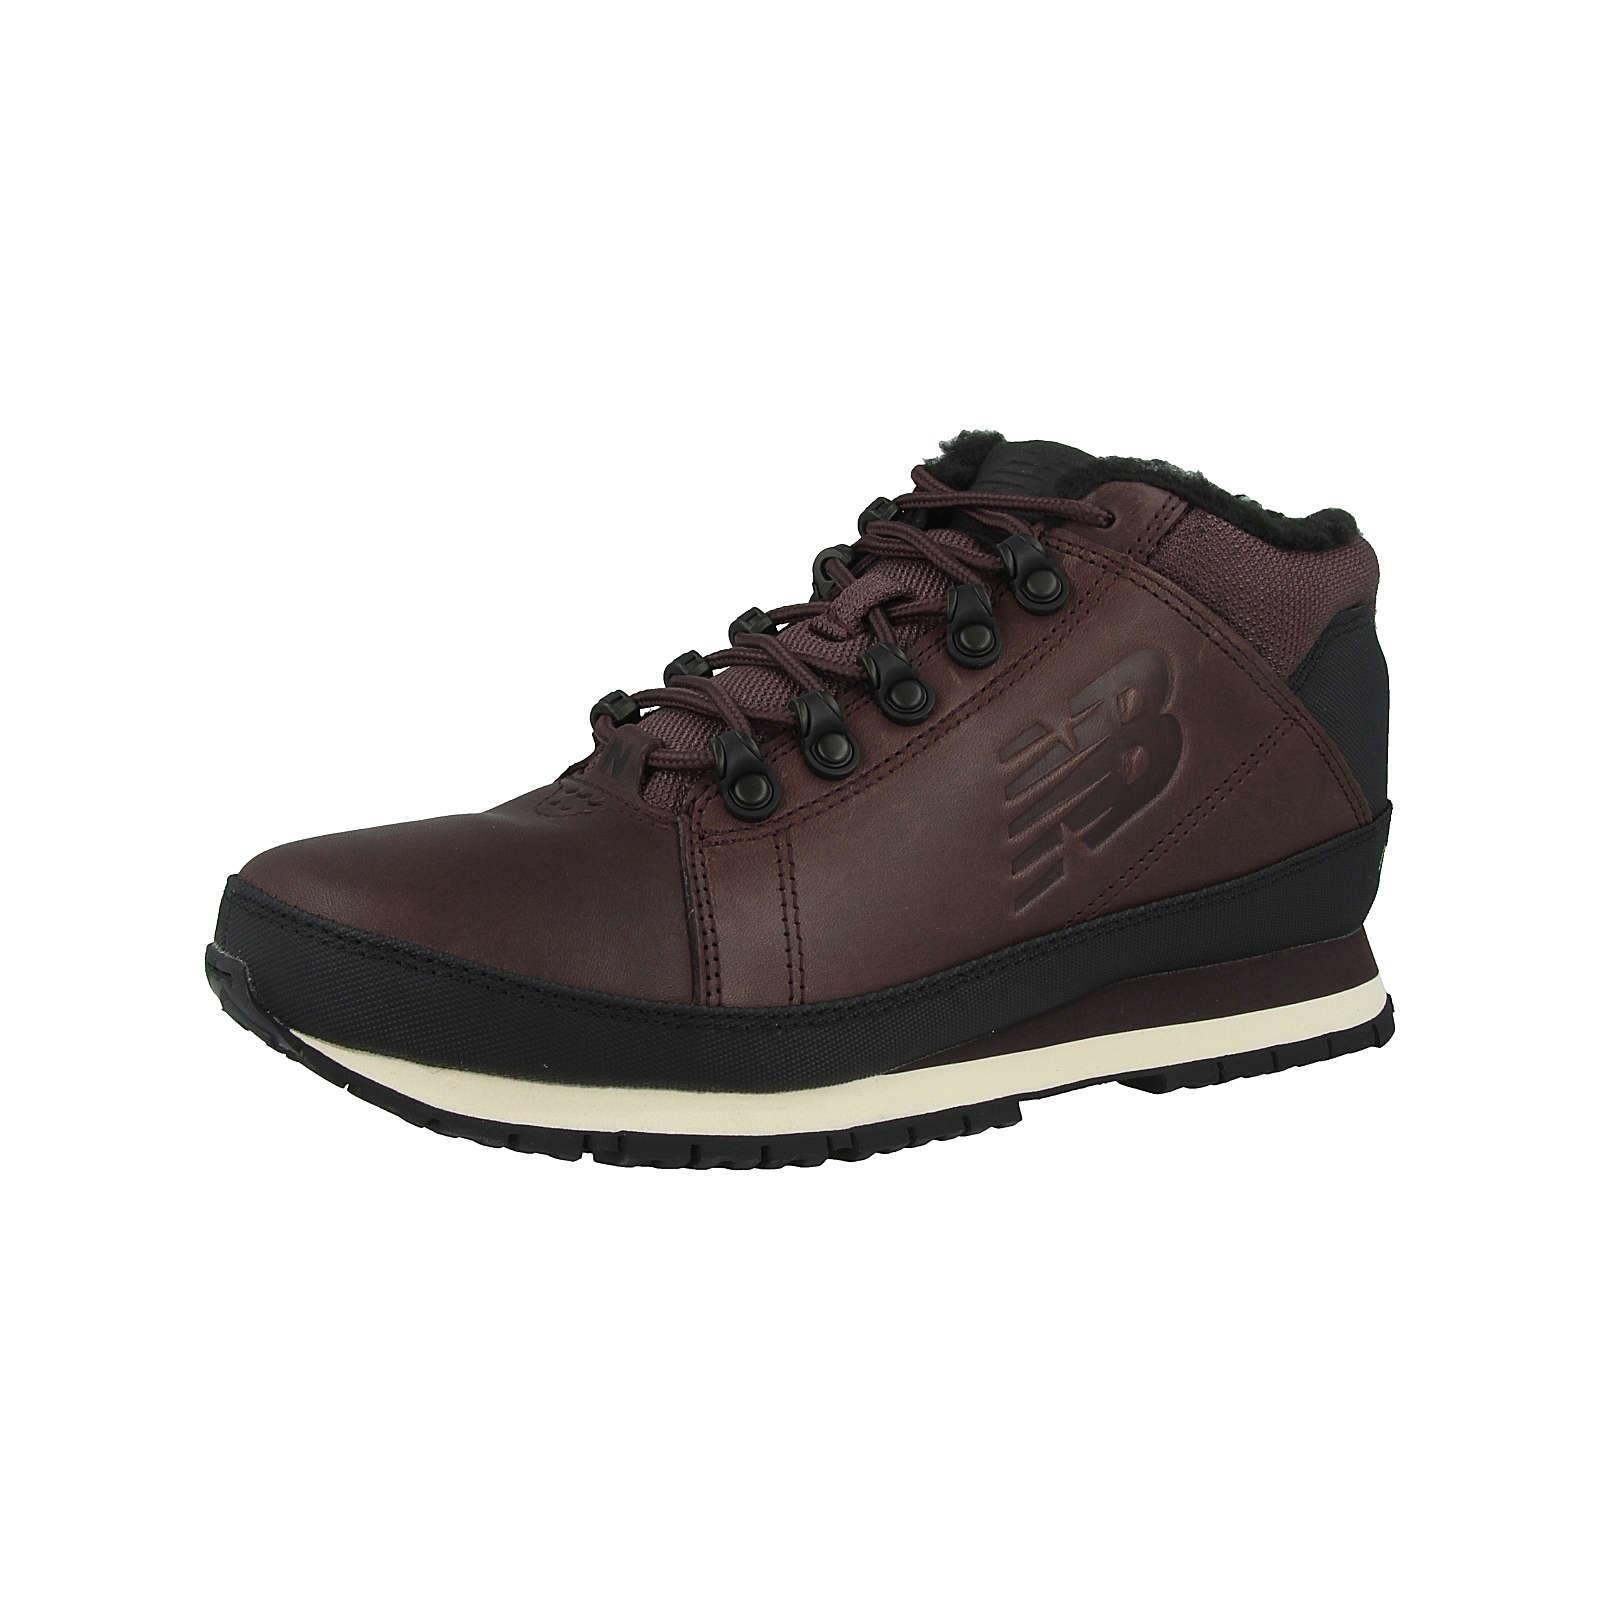 new balance Schuhe HL 754 Sneakers Low braun Herren Gr. 40,5